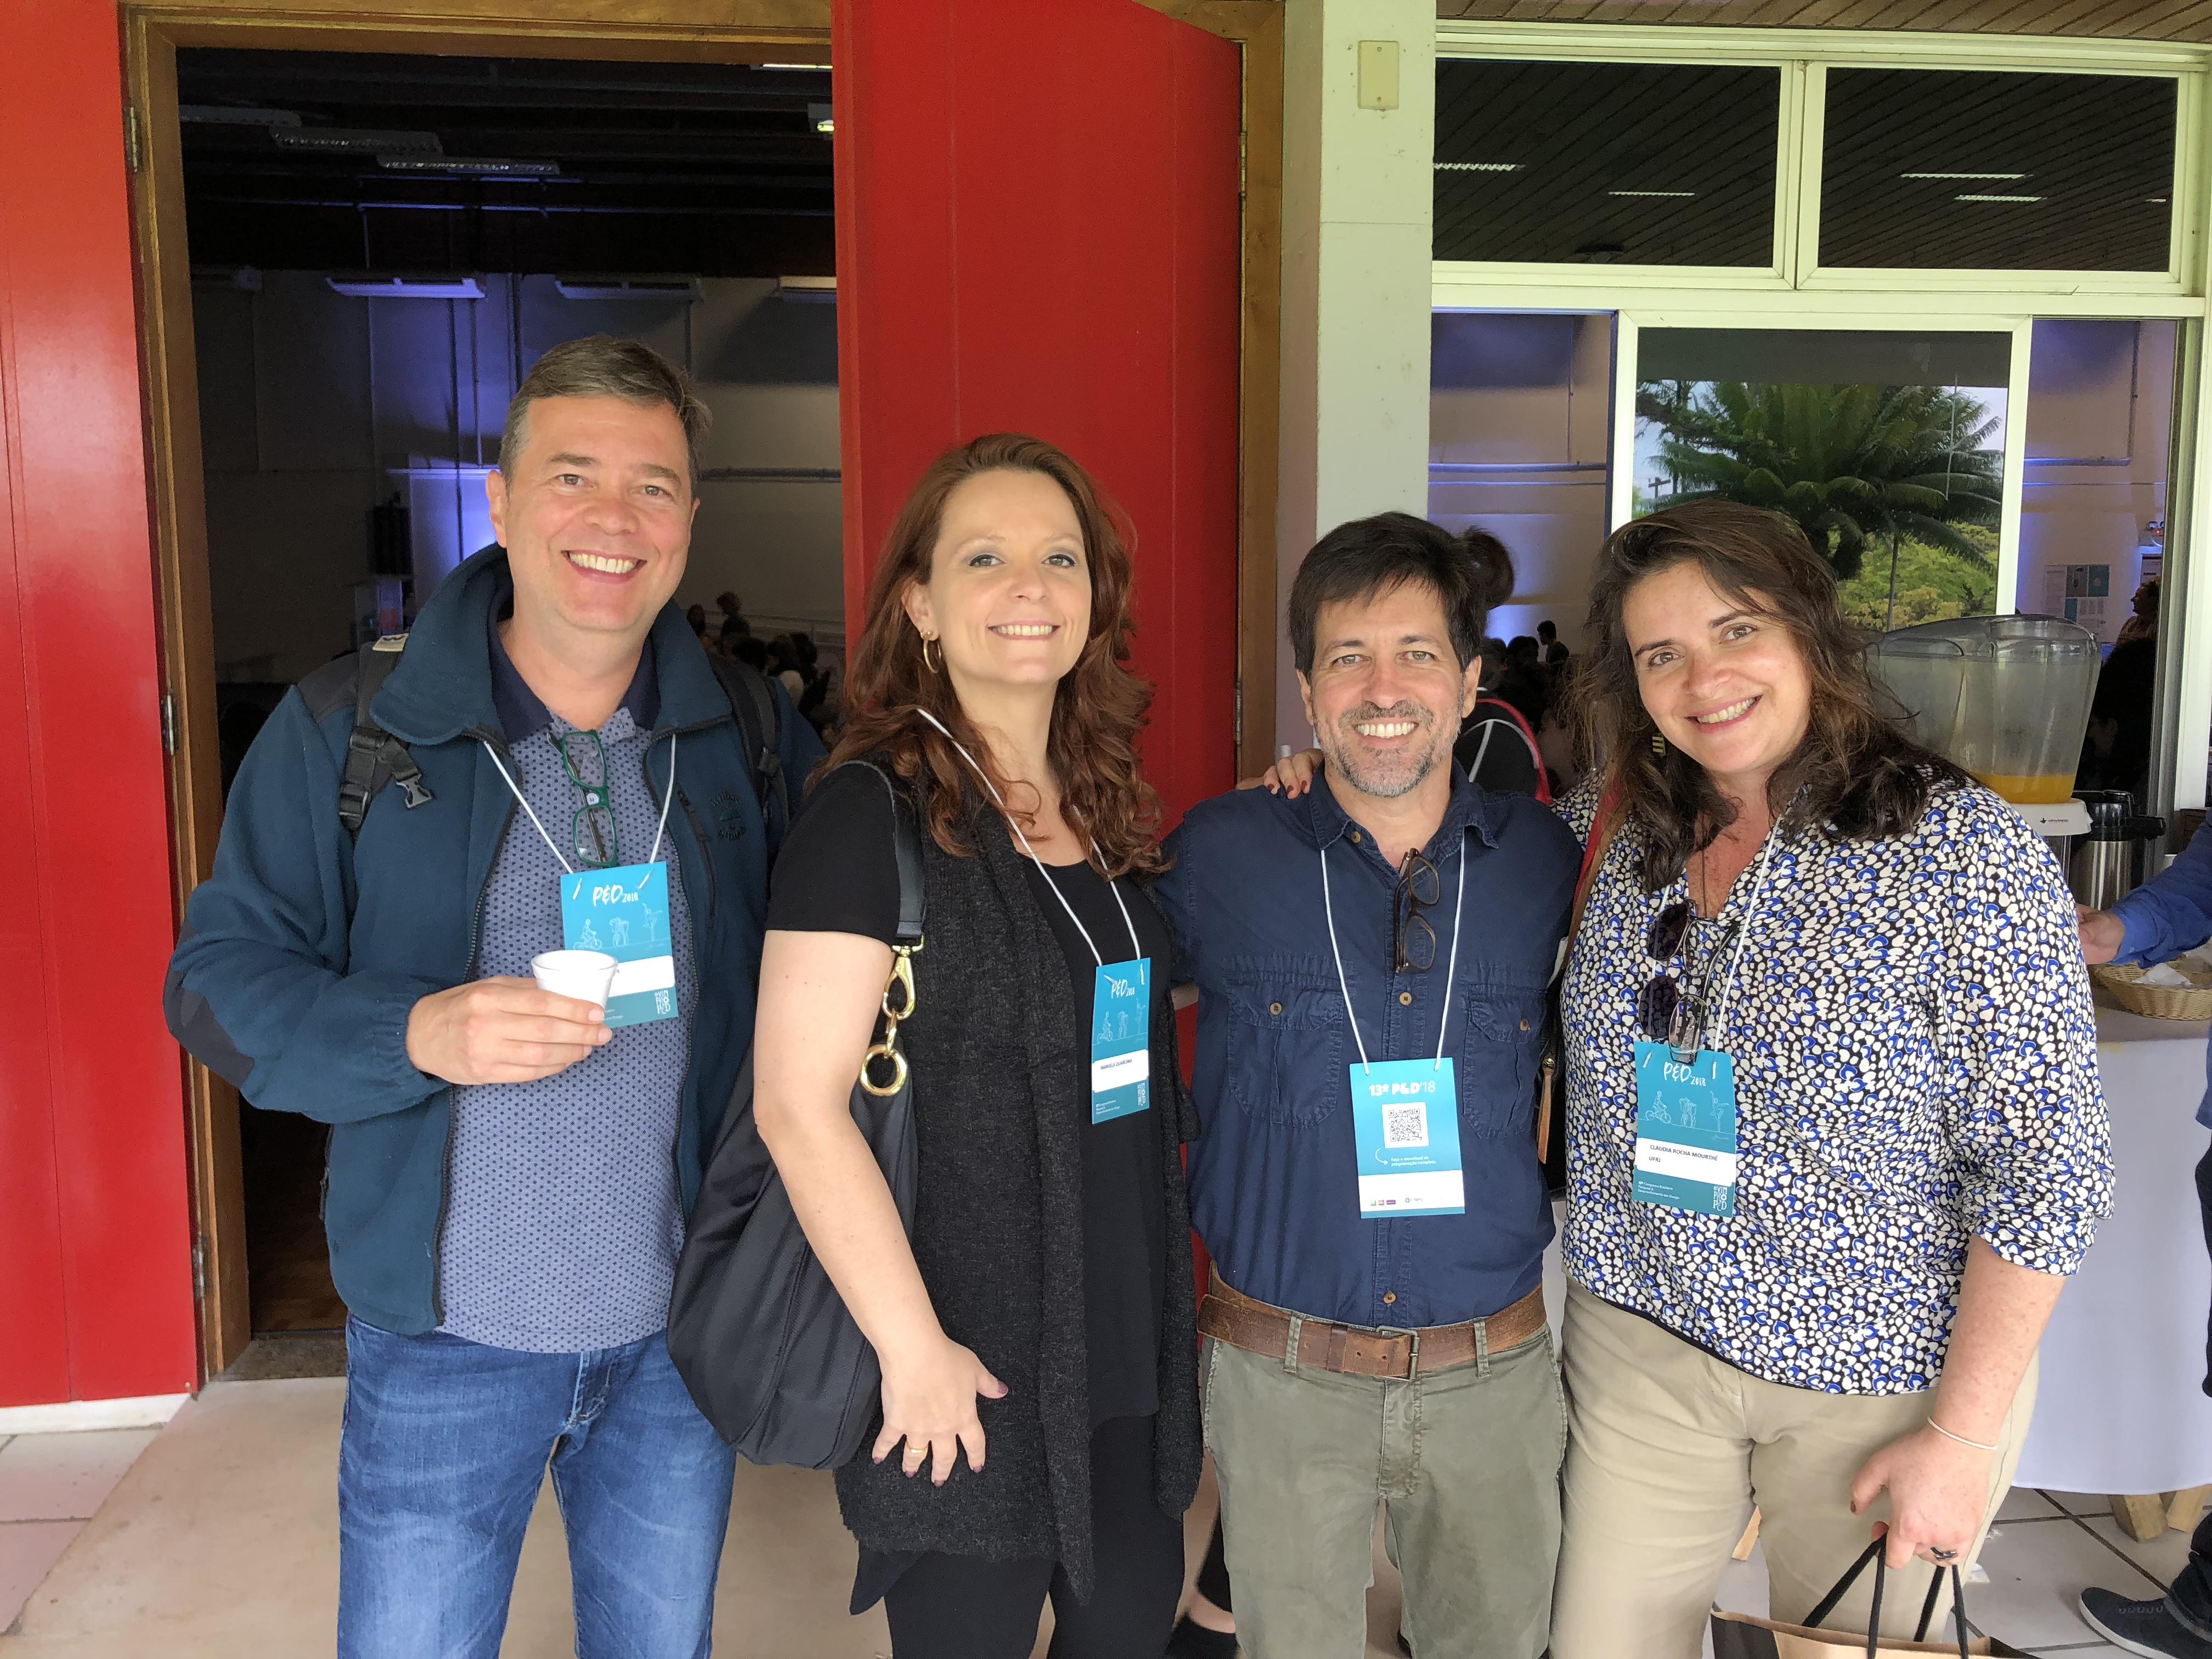 Luiz Agner, Manuela Quaresma, Giuseppe, Cláudia Mourthé - Joinville, 2018.